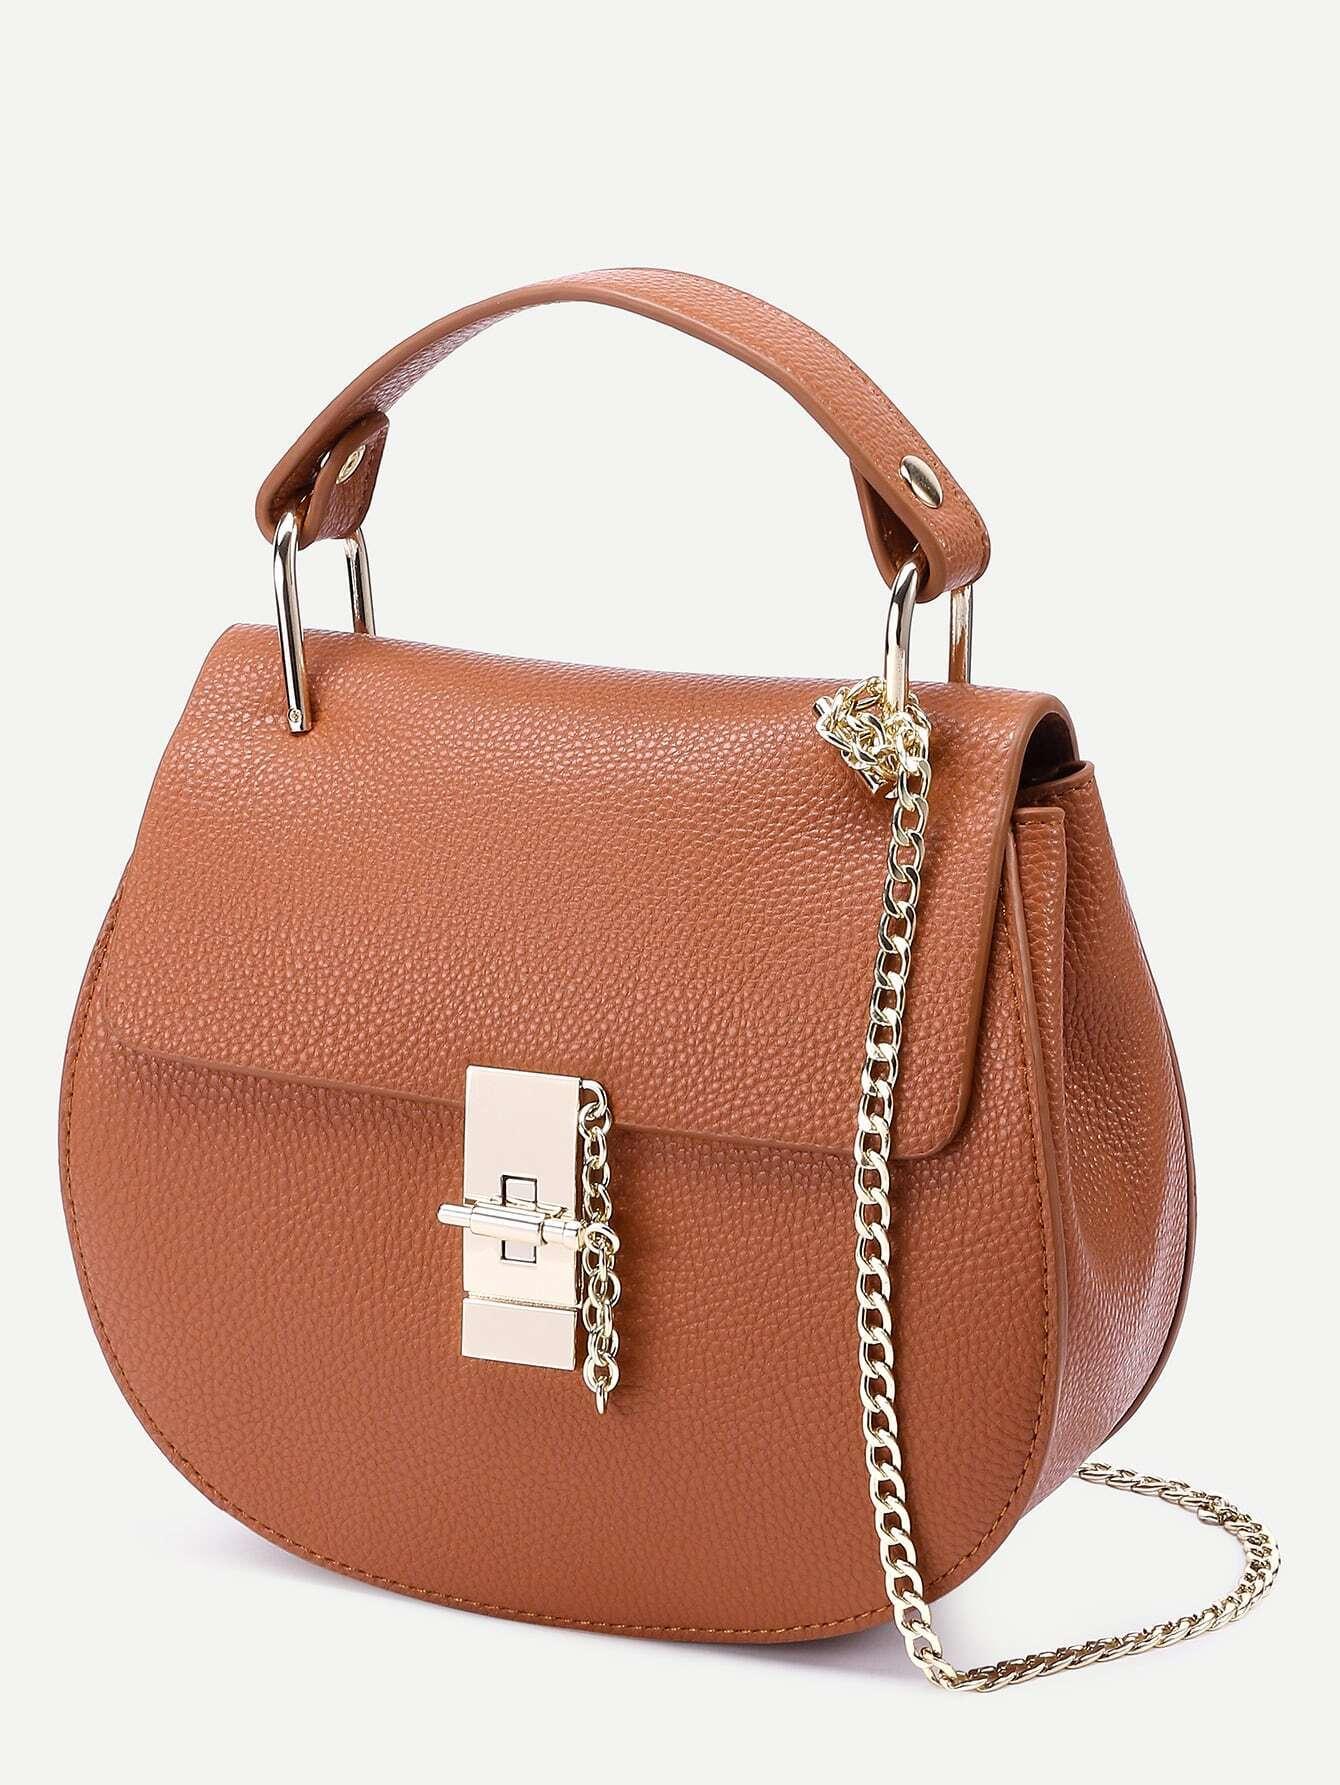 bag160824901_2